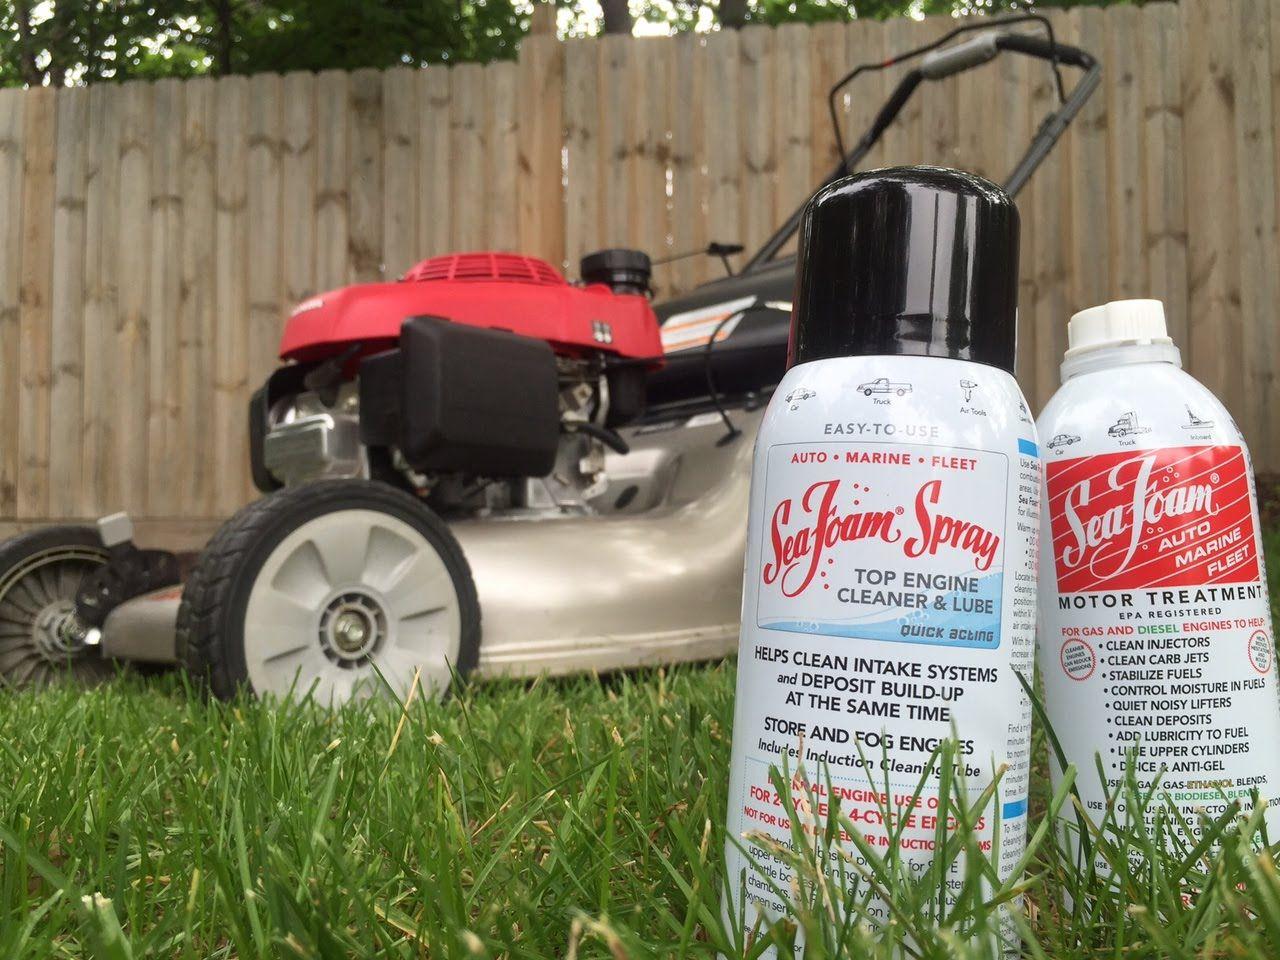 How To Clean A Lawn Mower Carburetor And Intake Using Sea Foam Sea Foam Spray Cleaning Lawn Mower Foam